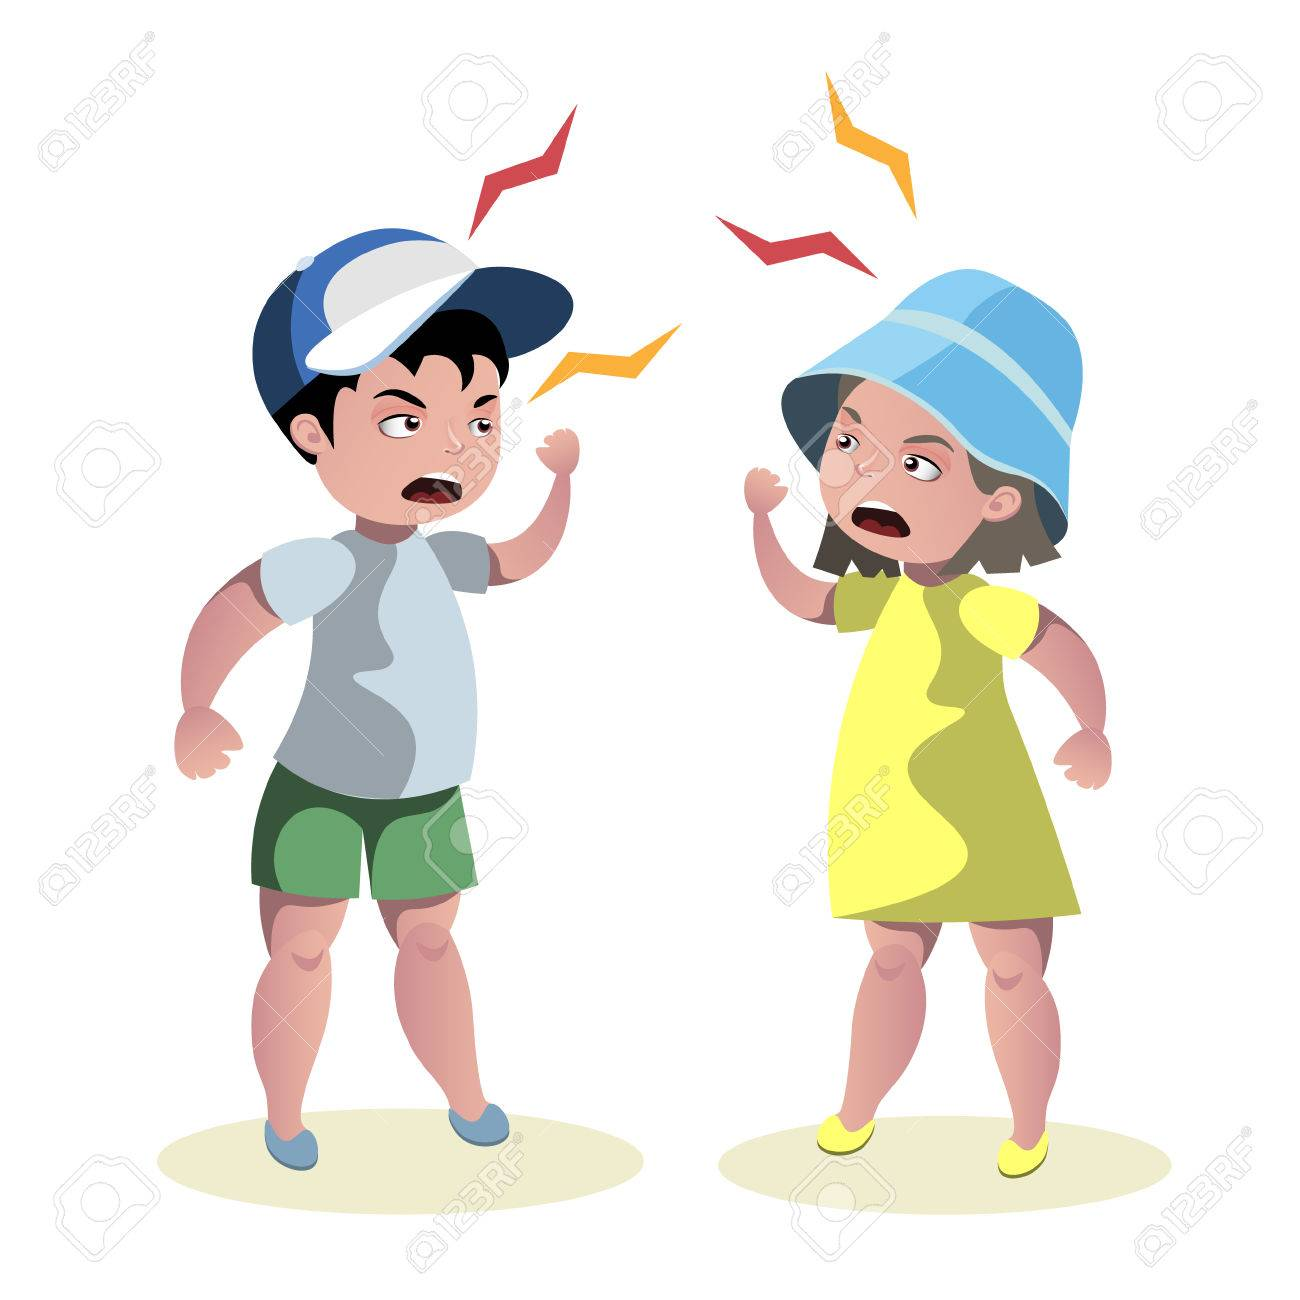 Small angry kids quarrel.